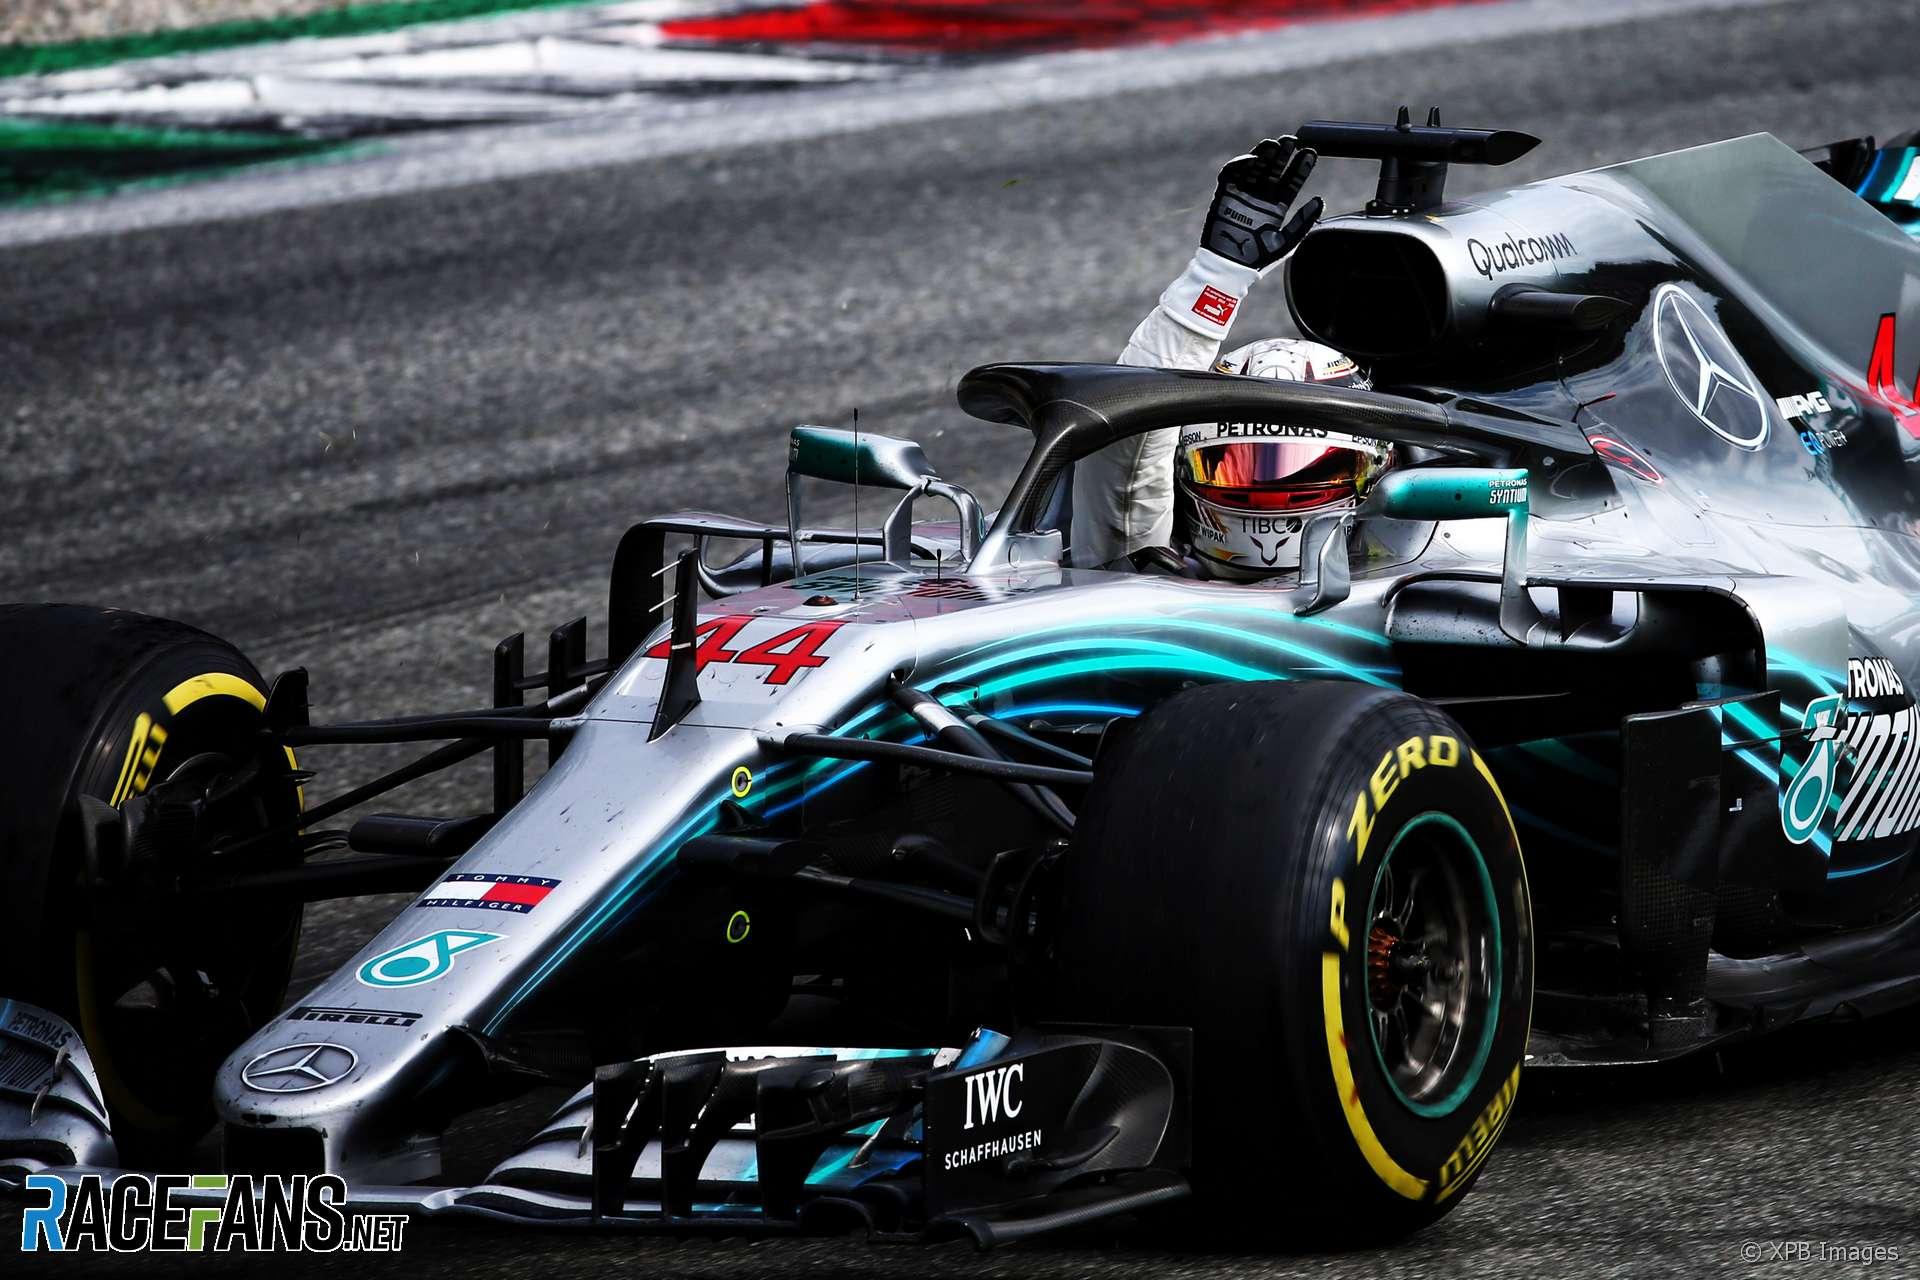 Lewis Hamilton, Mercedes, Monza, 2018